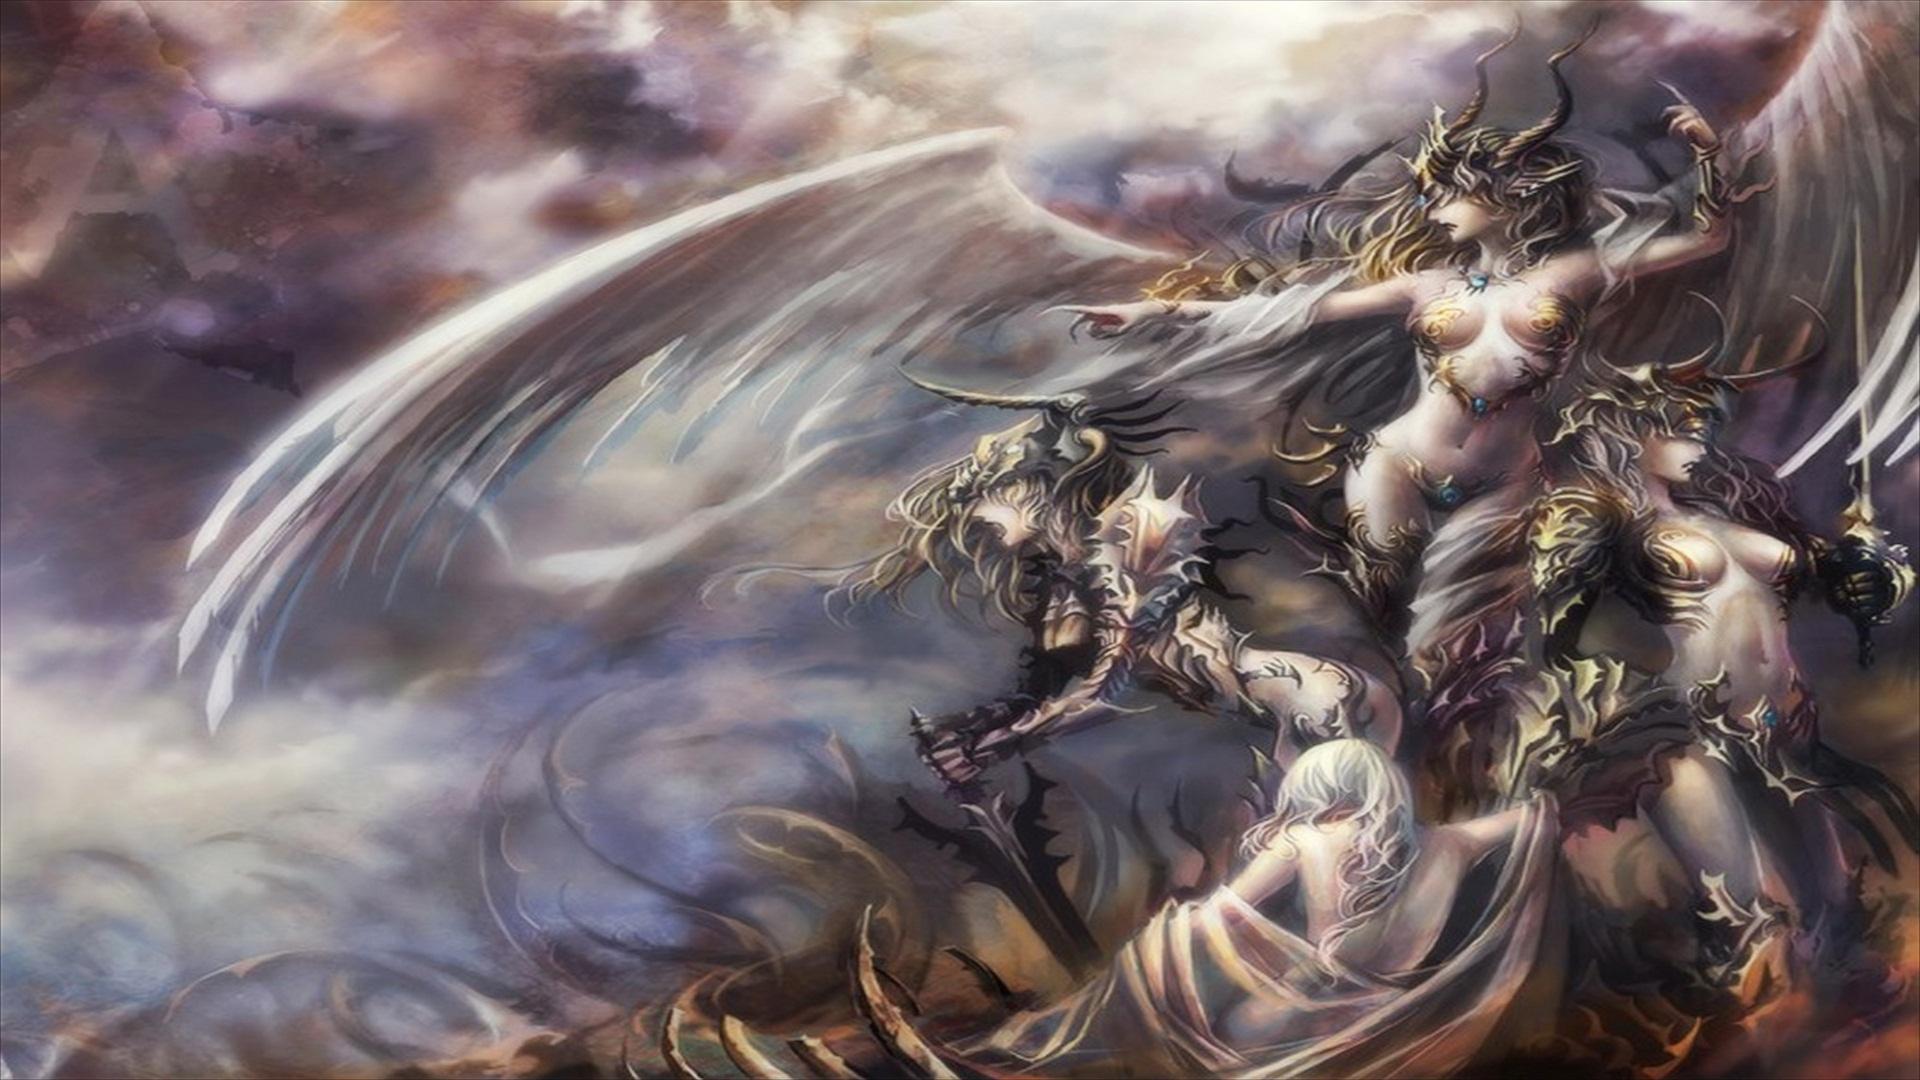 193 Angel Warrior HD Wallpapers | Backgrounds - Wallpaper ...